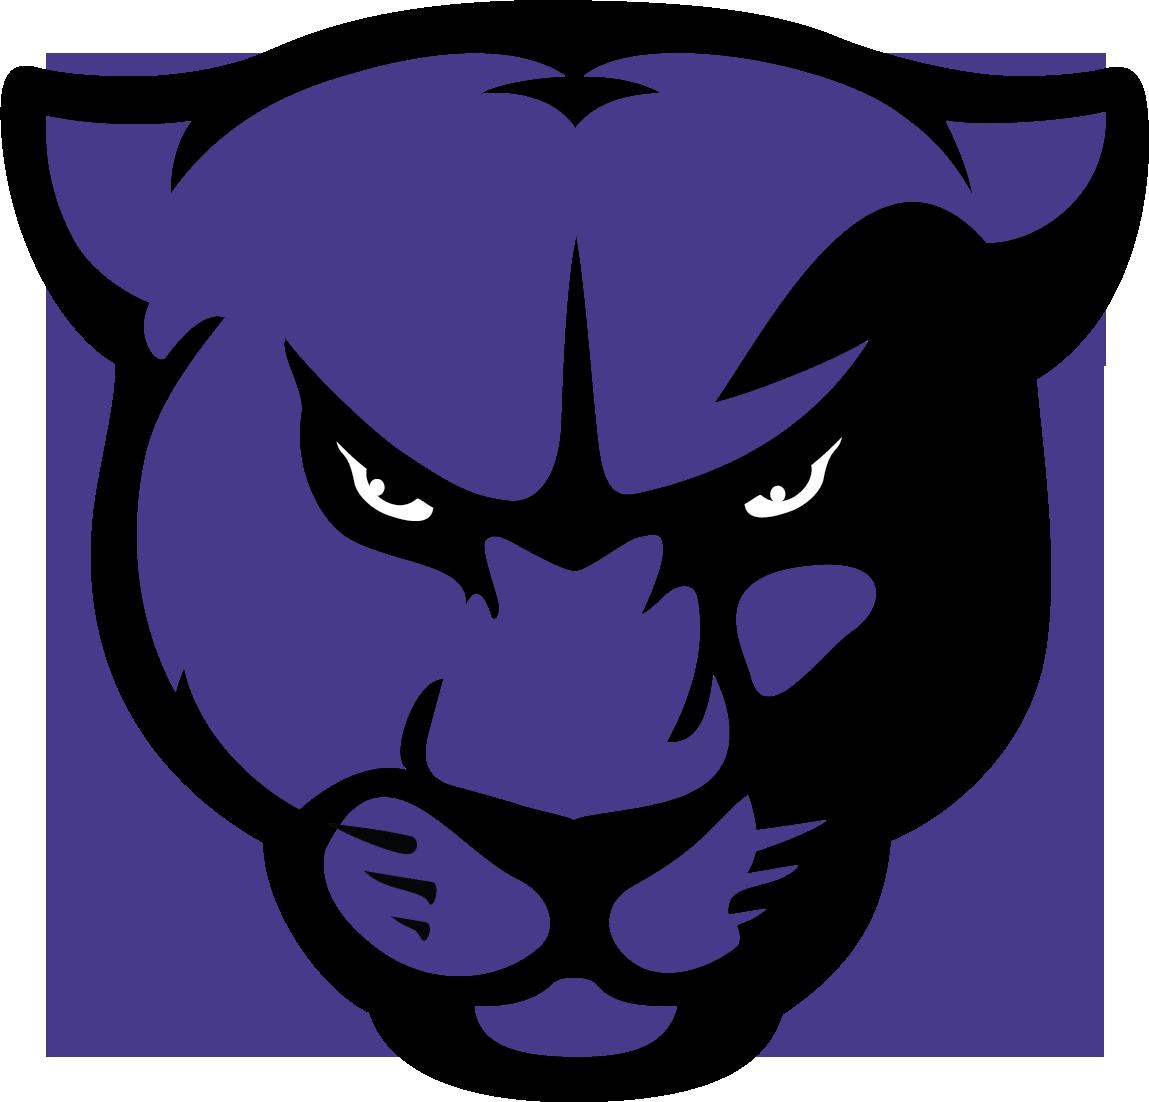 Pin By Loise Setiawan Wijaya On Panthers Cougars Wildcats Logos Graphic Design Logo Sports Logo Design Lion Head Tattoos